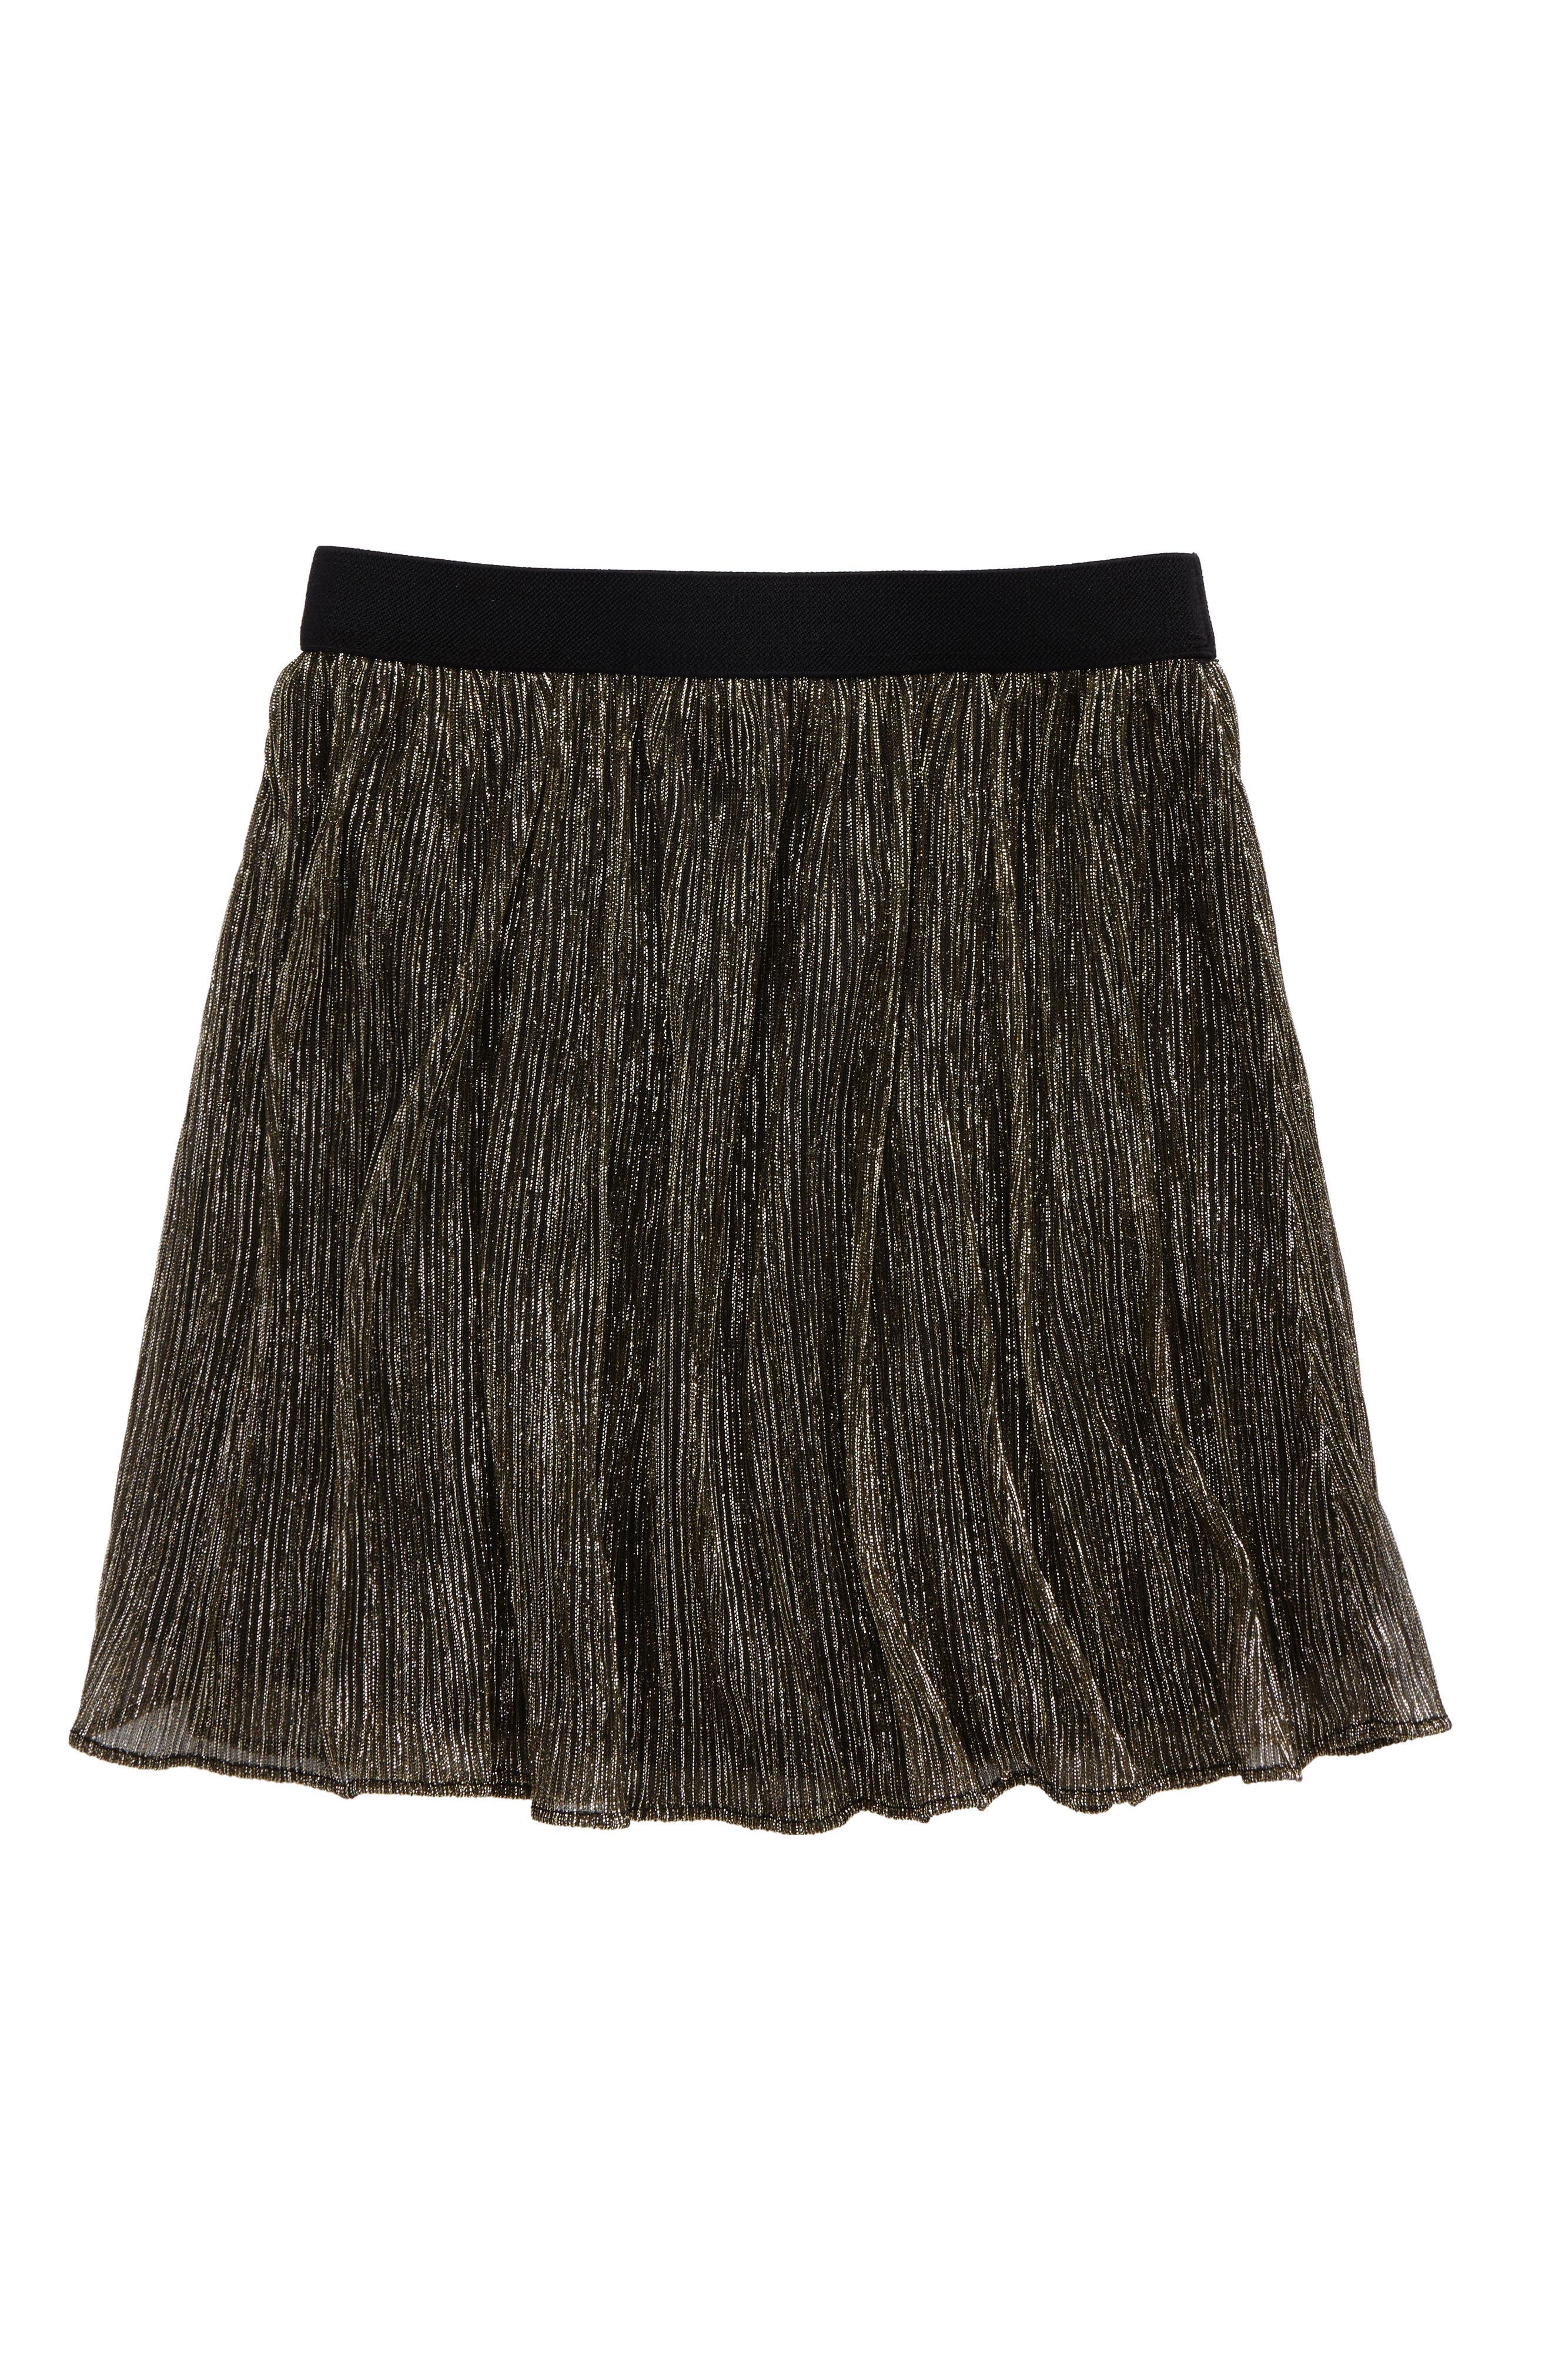 Pleated Metallic Skirt,                         Main,                         color, 220